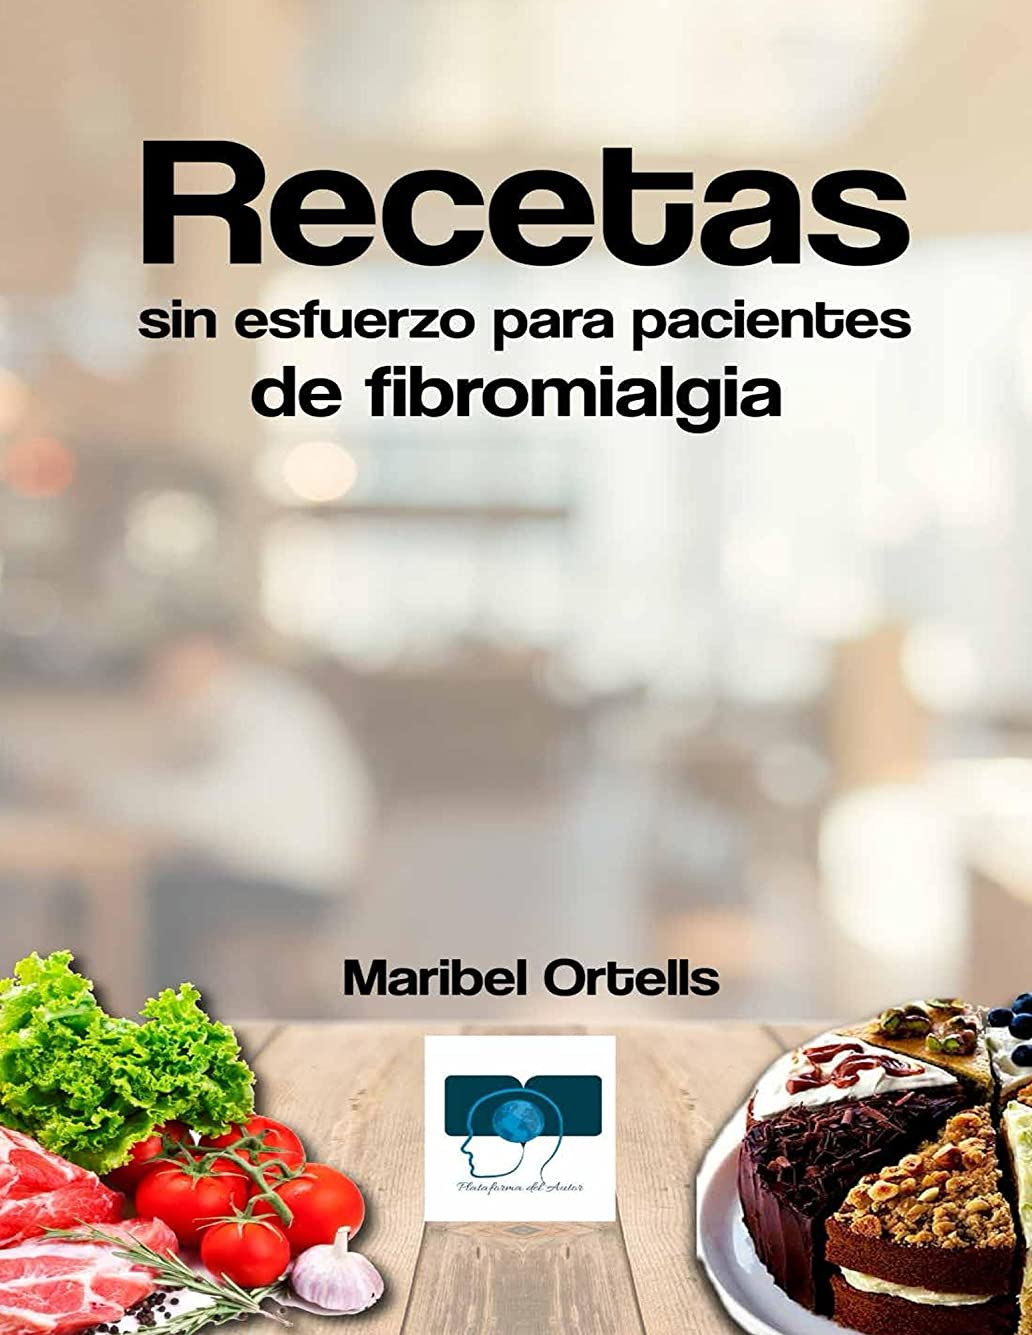 Recetas Sin Esfuerzo para Pacientes de Fibromialgia (Spanish Edition)